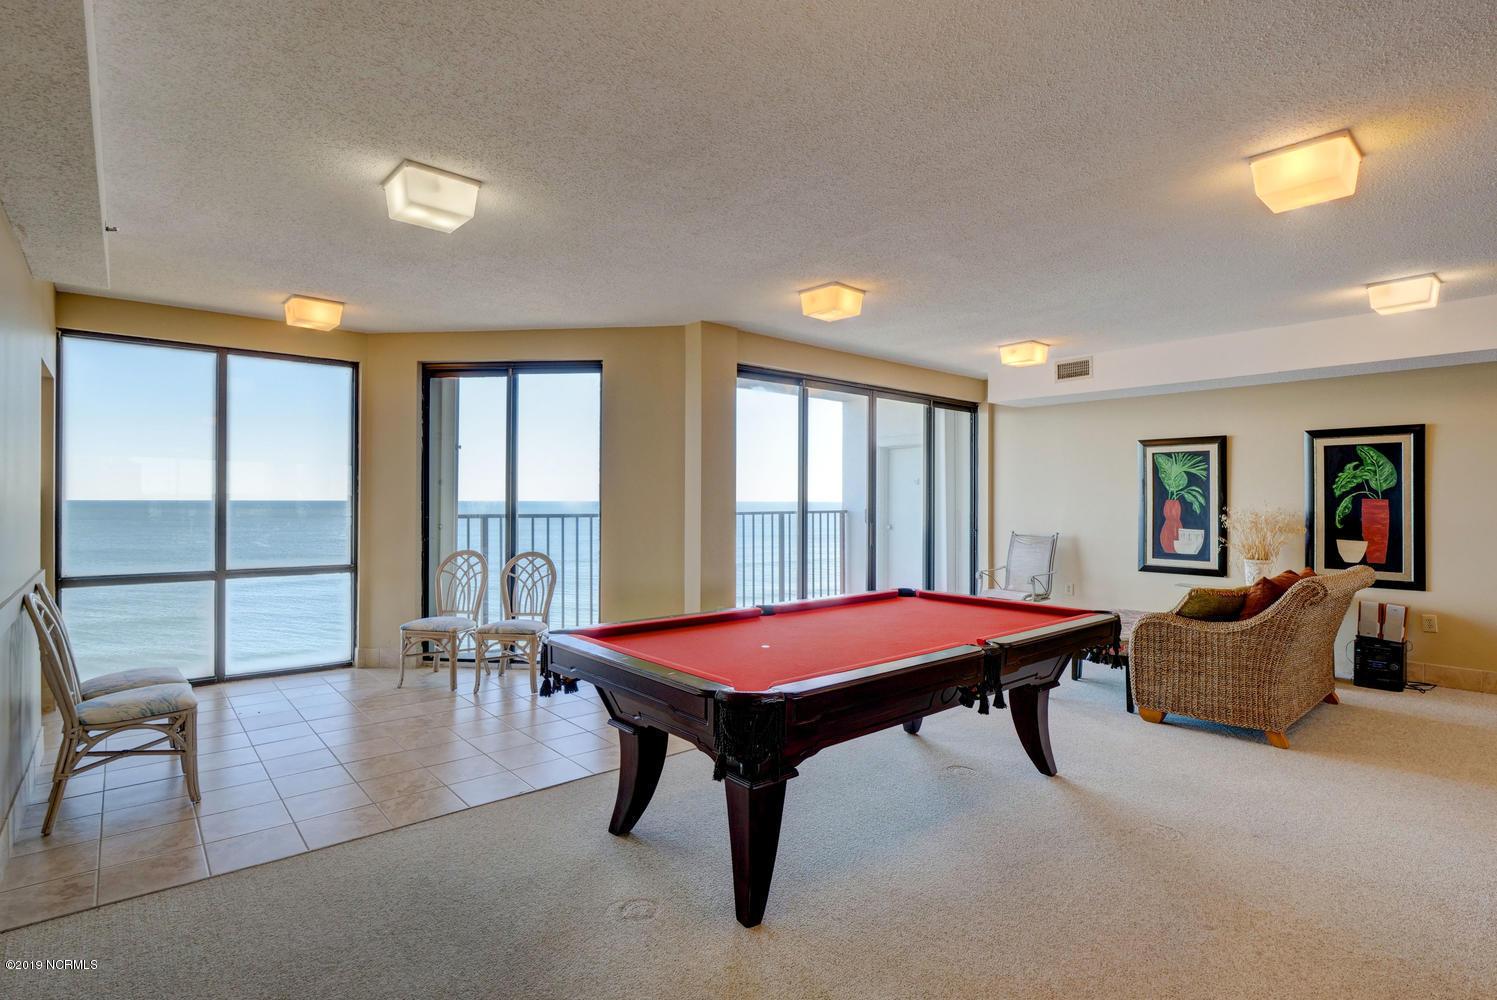 4110 Island Drive, North Topsail Beach, North Carolina 28460, 4 Bedrooms Bedrooms, 7 Rooms Rooms,3 BathroomsBathrooms,Condominium,For sale,Island,100191693